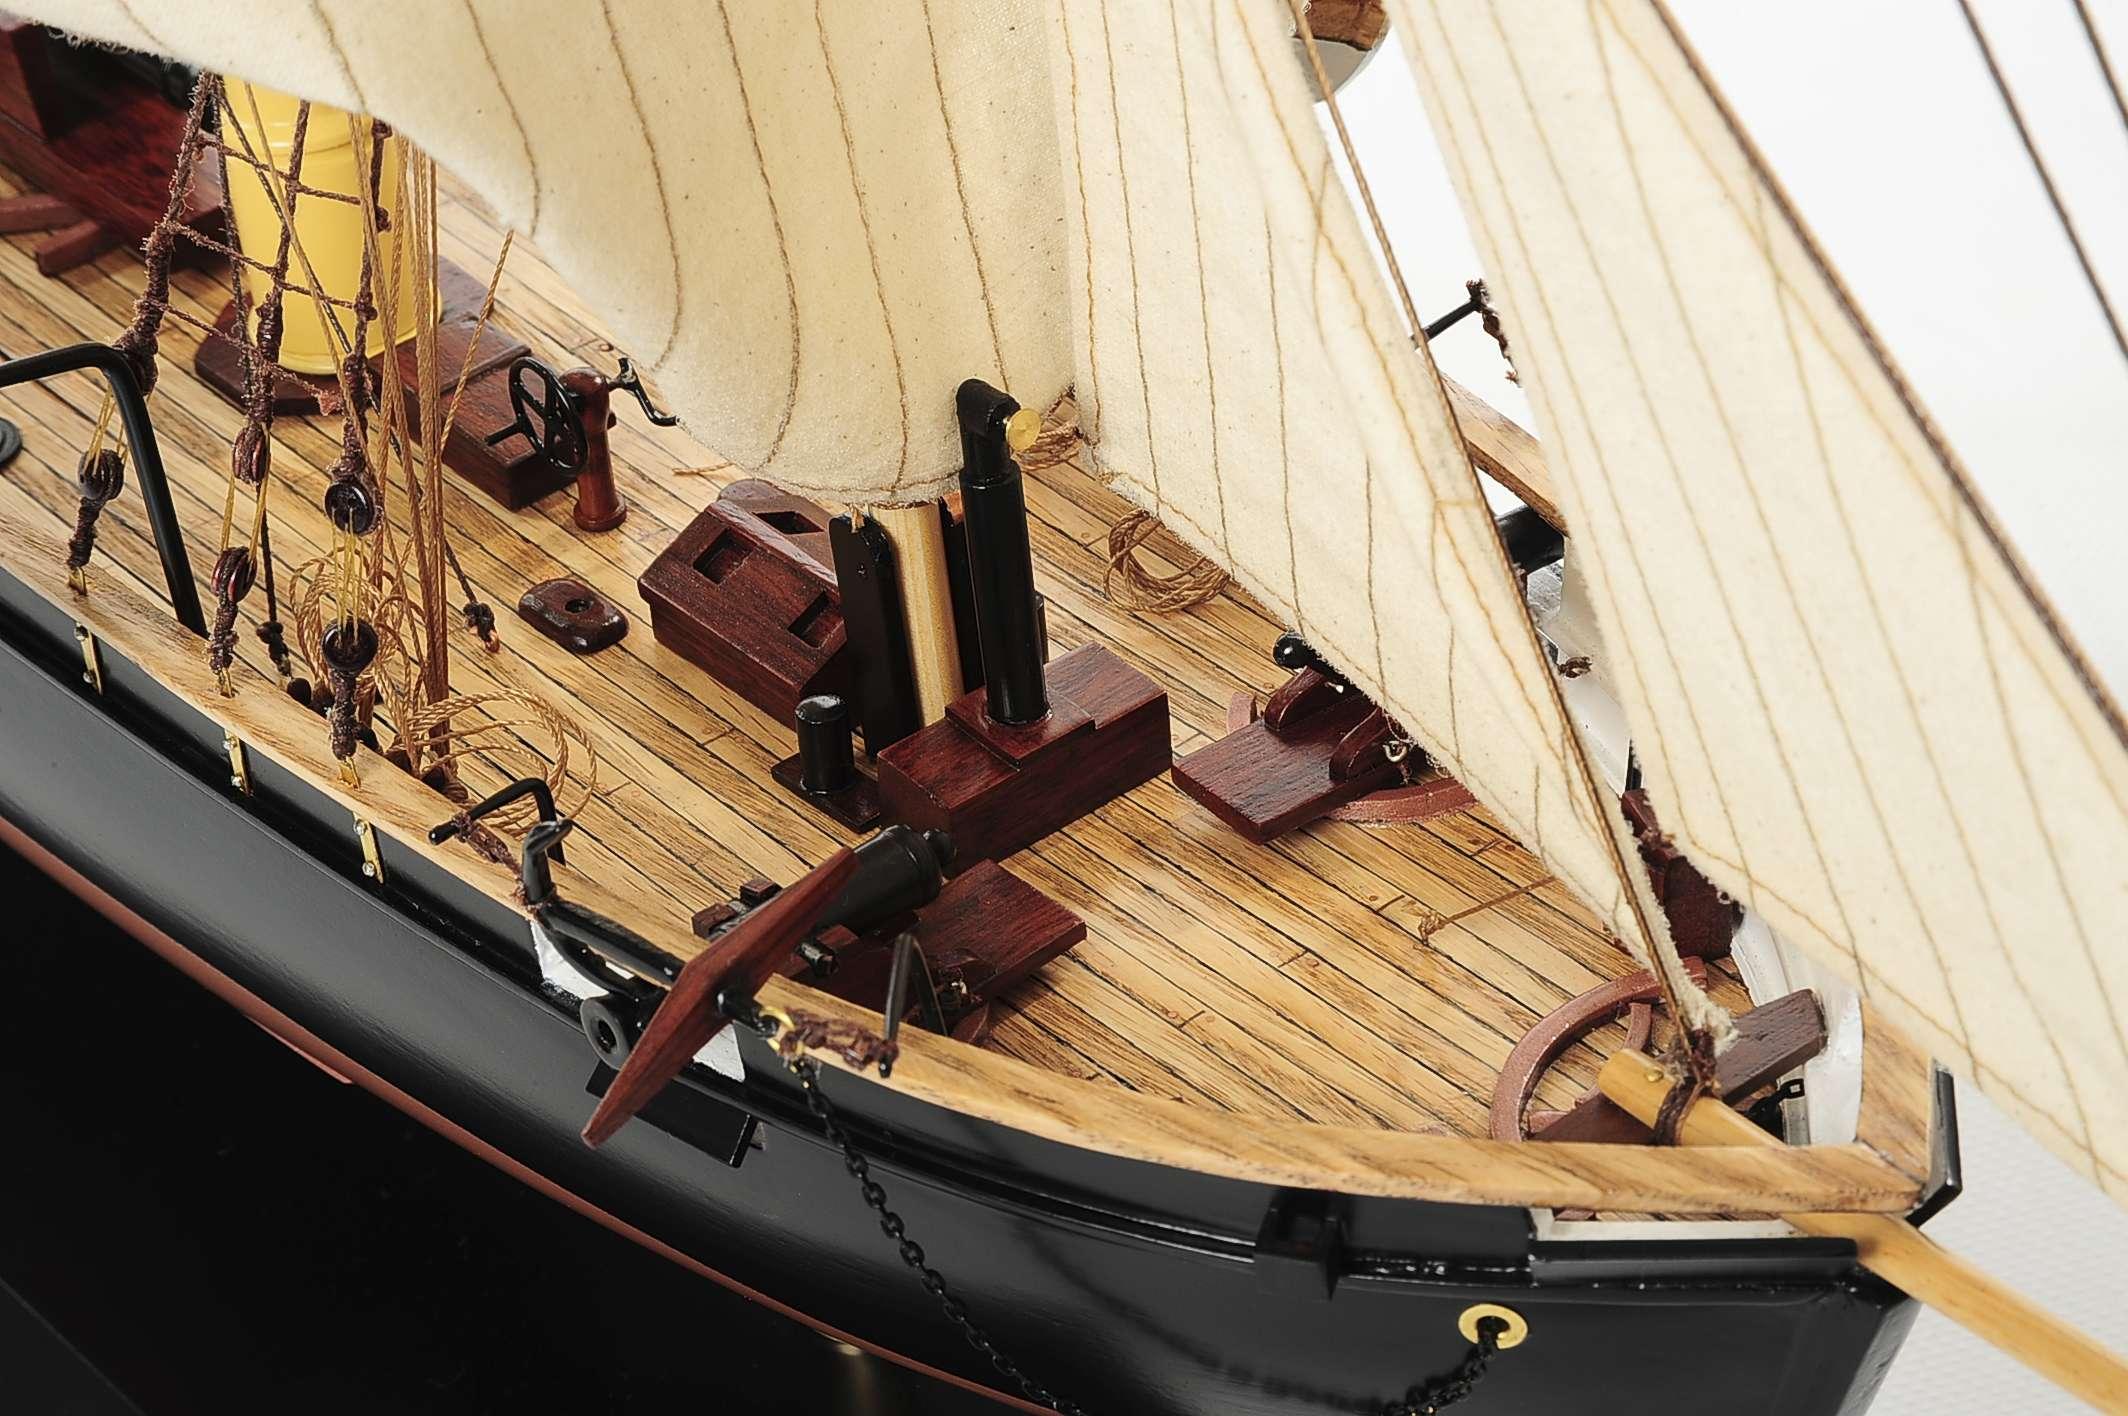 1428-4657-HMS-Cockchafer-2-Model-Boat